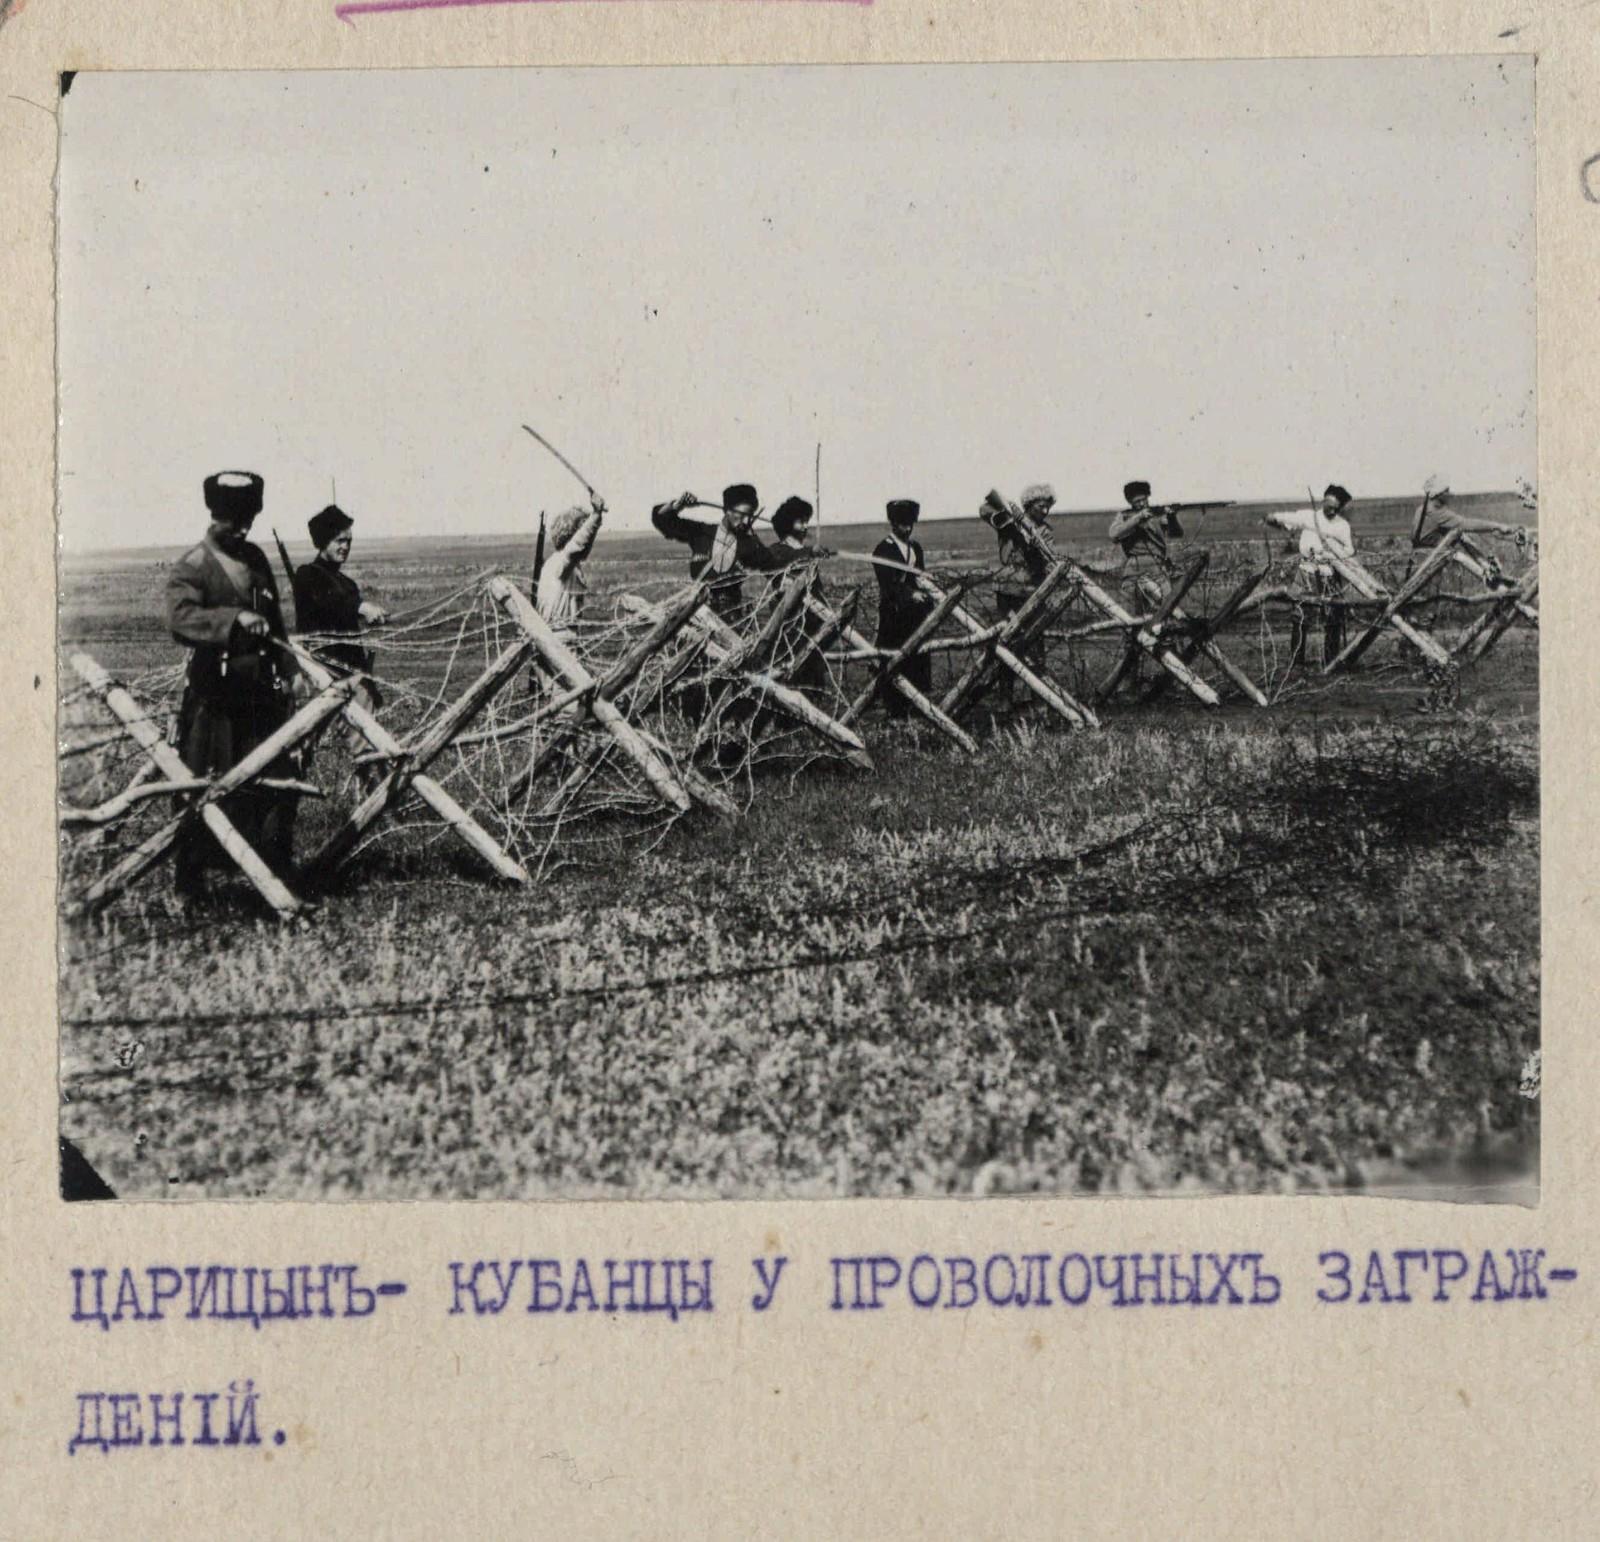 1919. Царицын.Кубанцы у проволочных заграждений